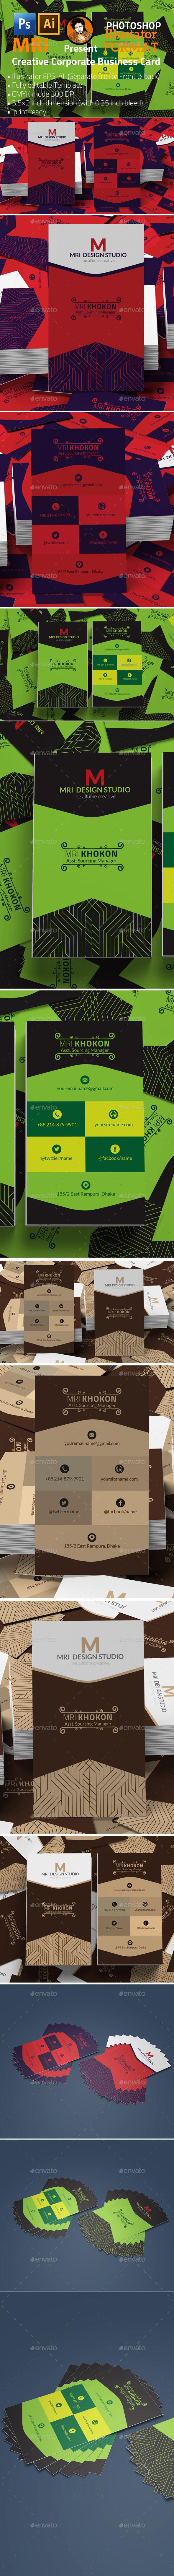 GraphicRiver Creative Corporate Business Card 11904960